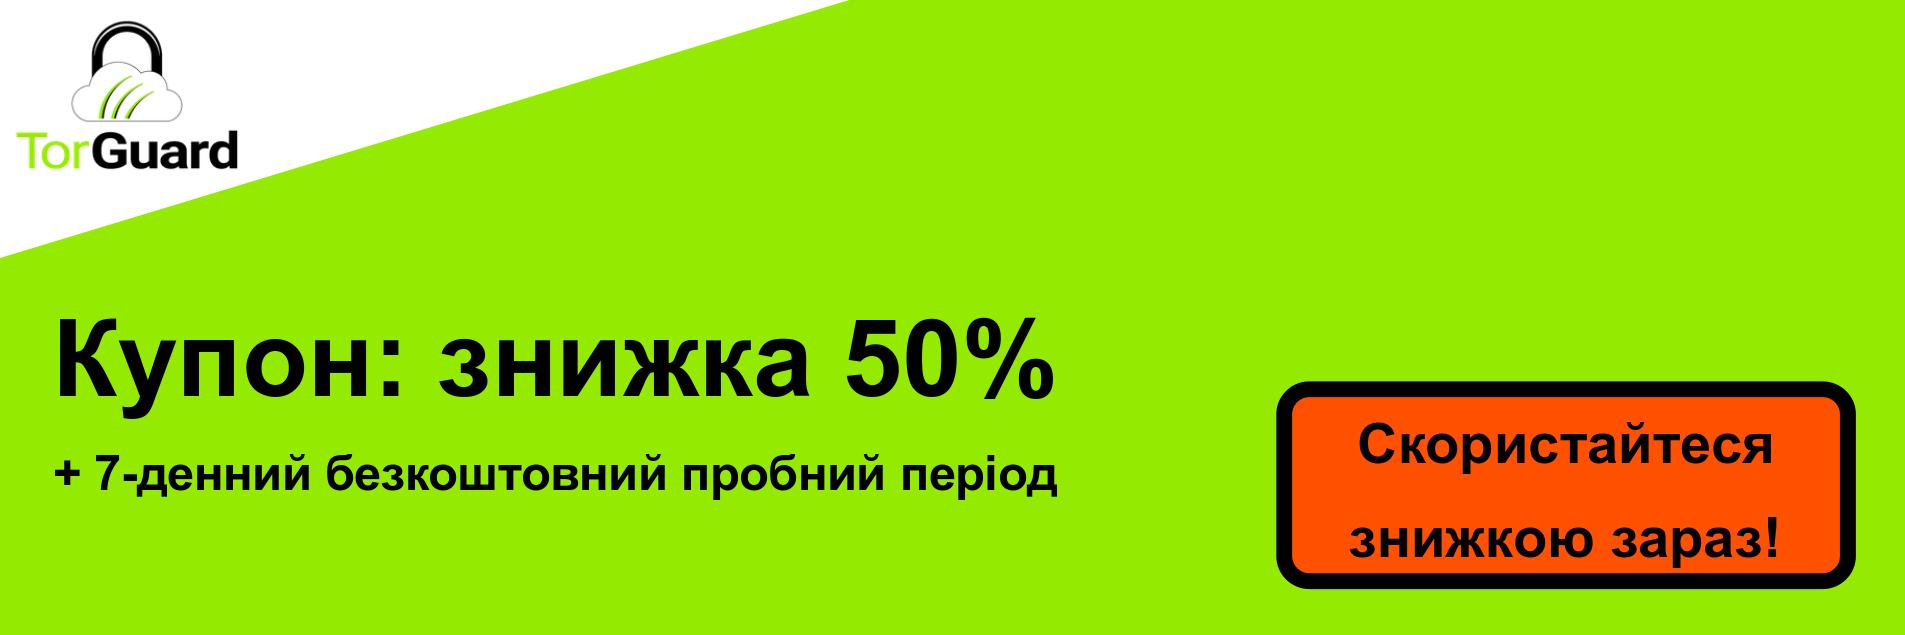 Банер купона TorGuard VPN - знижка 50%